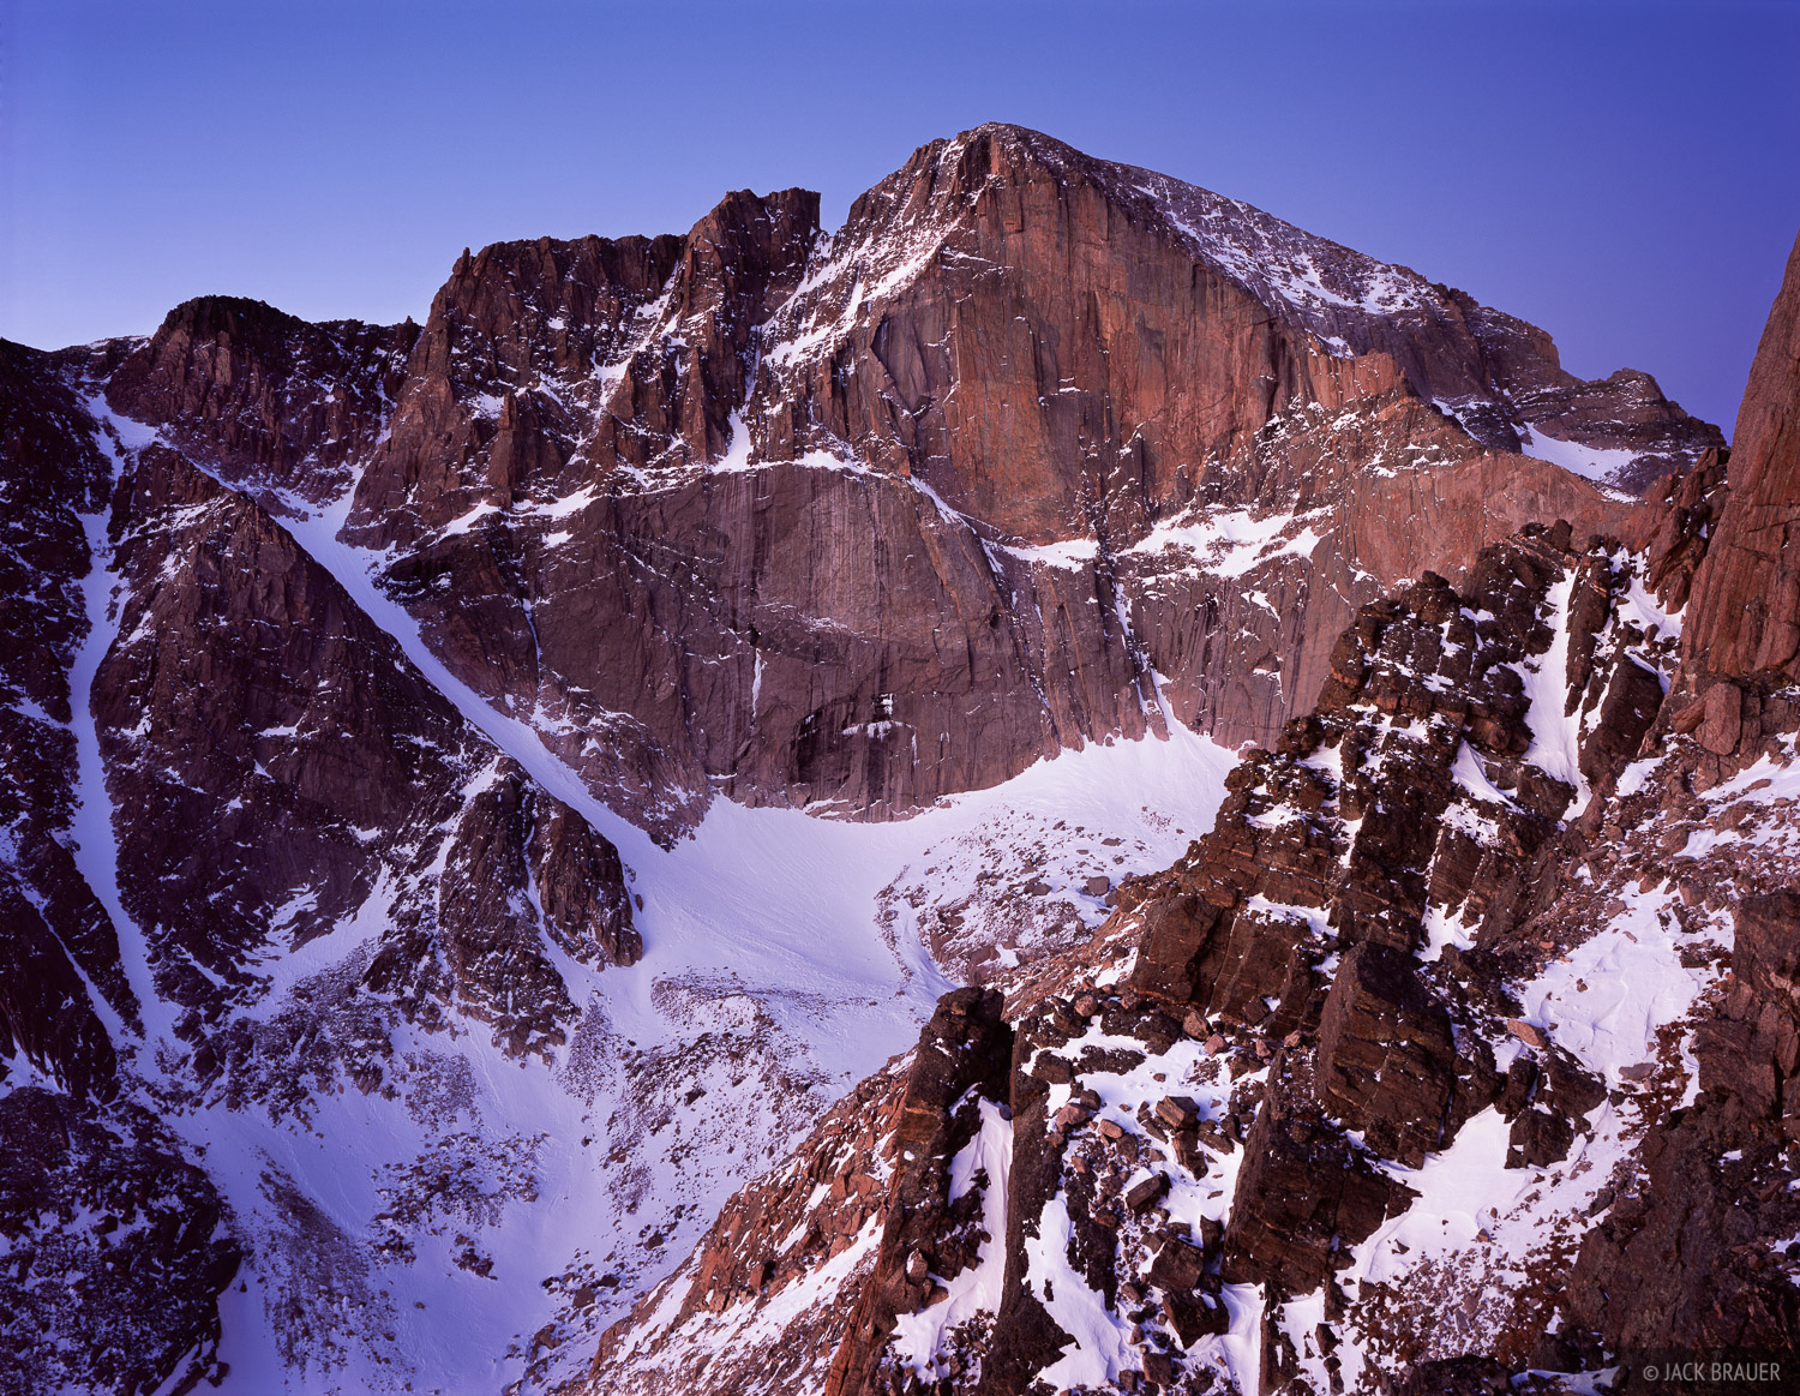 dawn light on The Diamond of Longs Peak, 14261 feet, as seen from Mt. Lady Washington - December